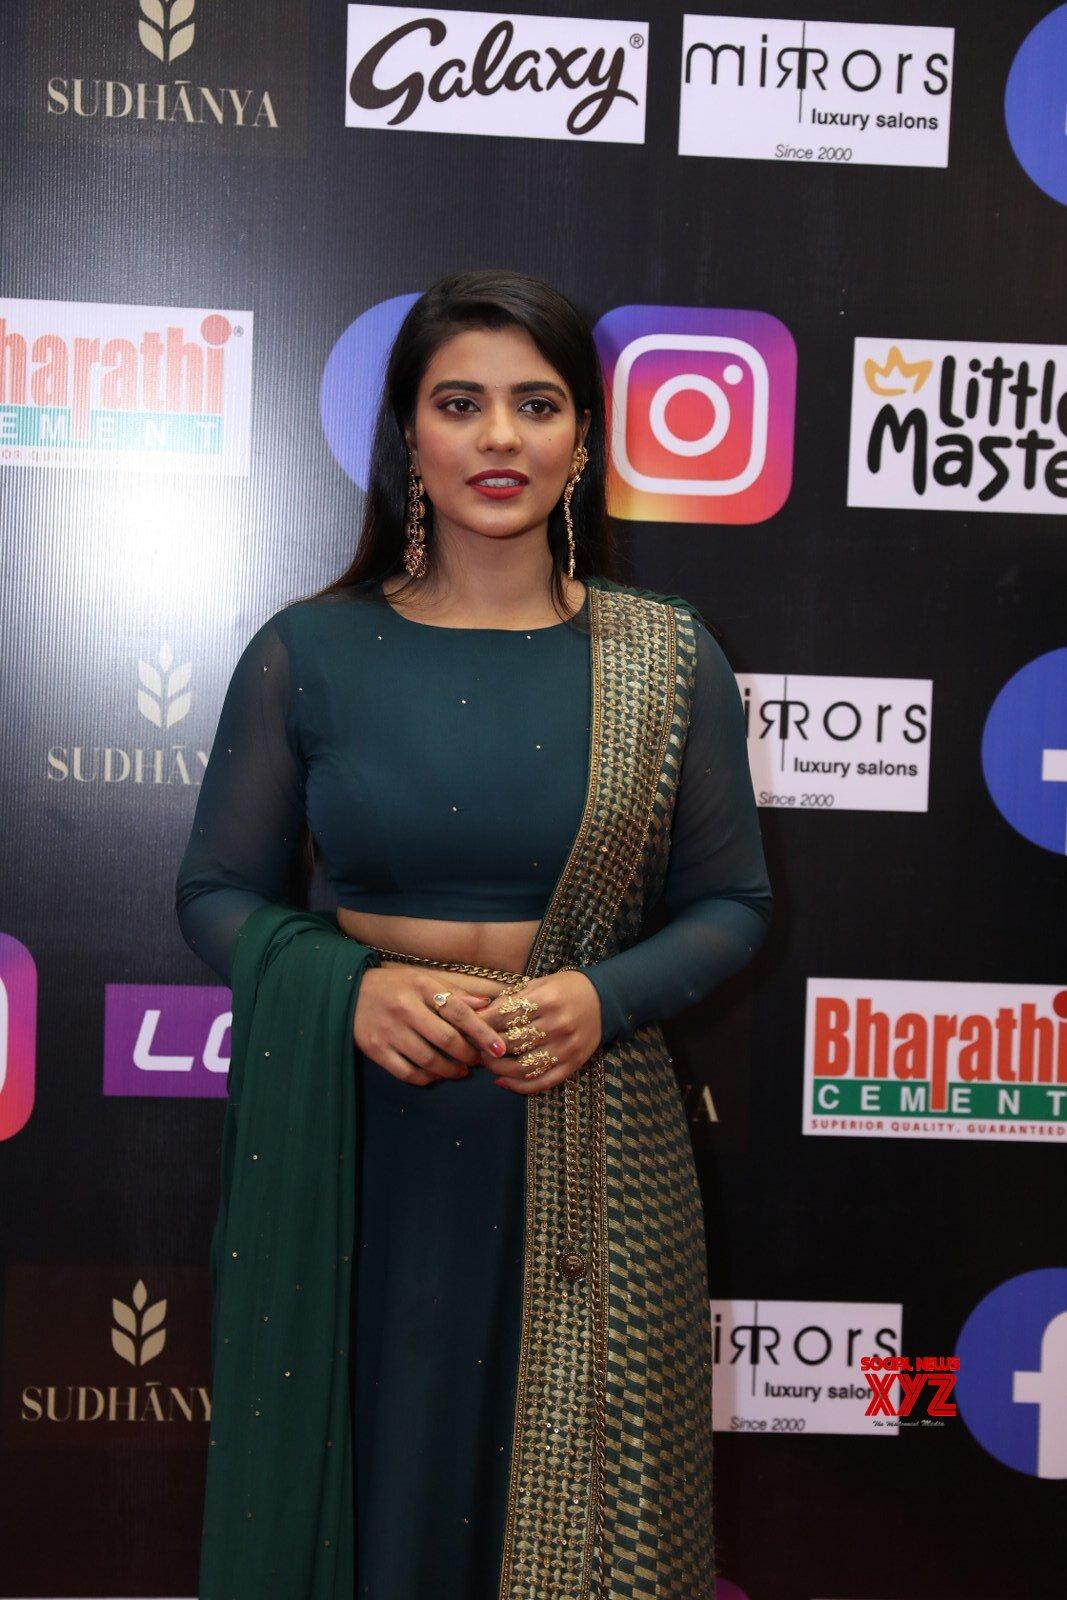 Actress Aishwarya Rajesh Glam Stills From SIIMA Awards 2021 Day 2 Red Carpet